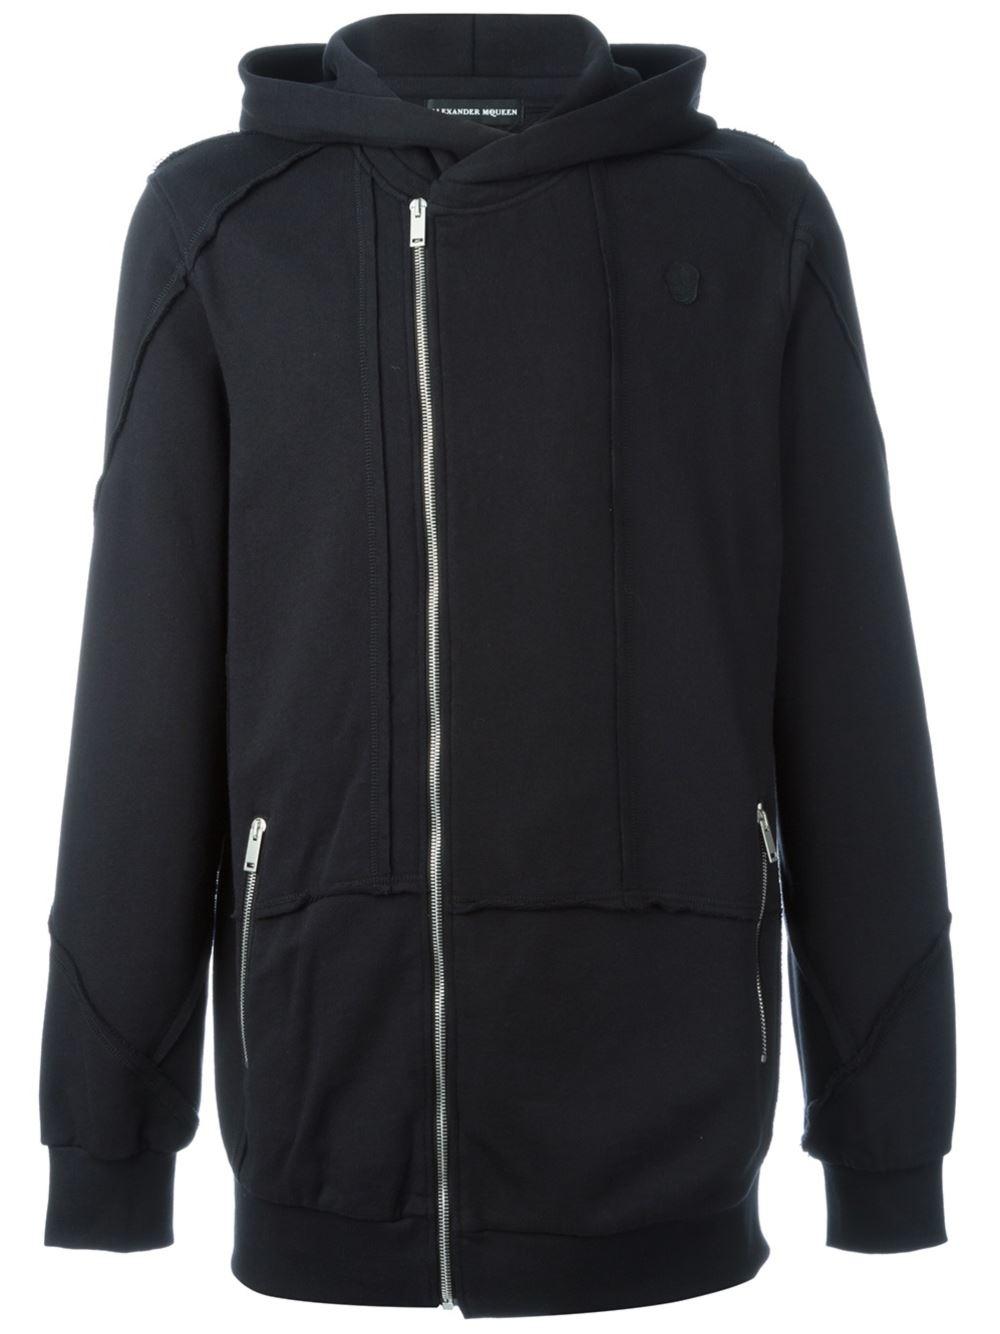 alexander mcqueen oversized hoodie in black for men lyst. Black Bedroom Furniture Sets. Home Design Ideas